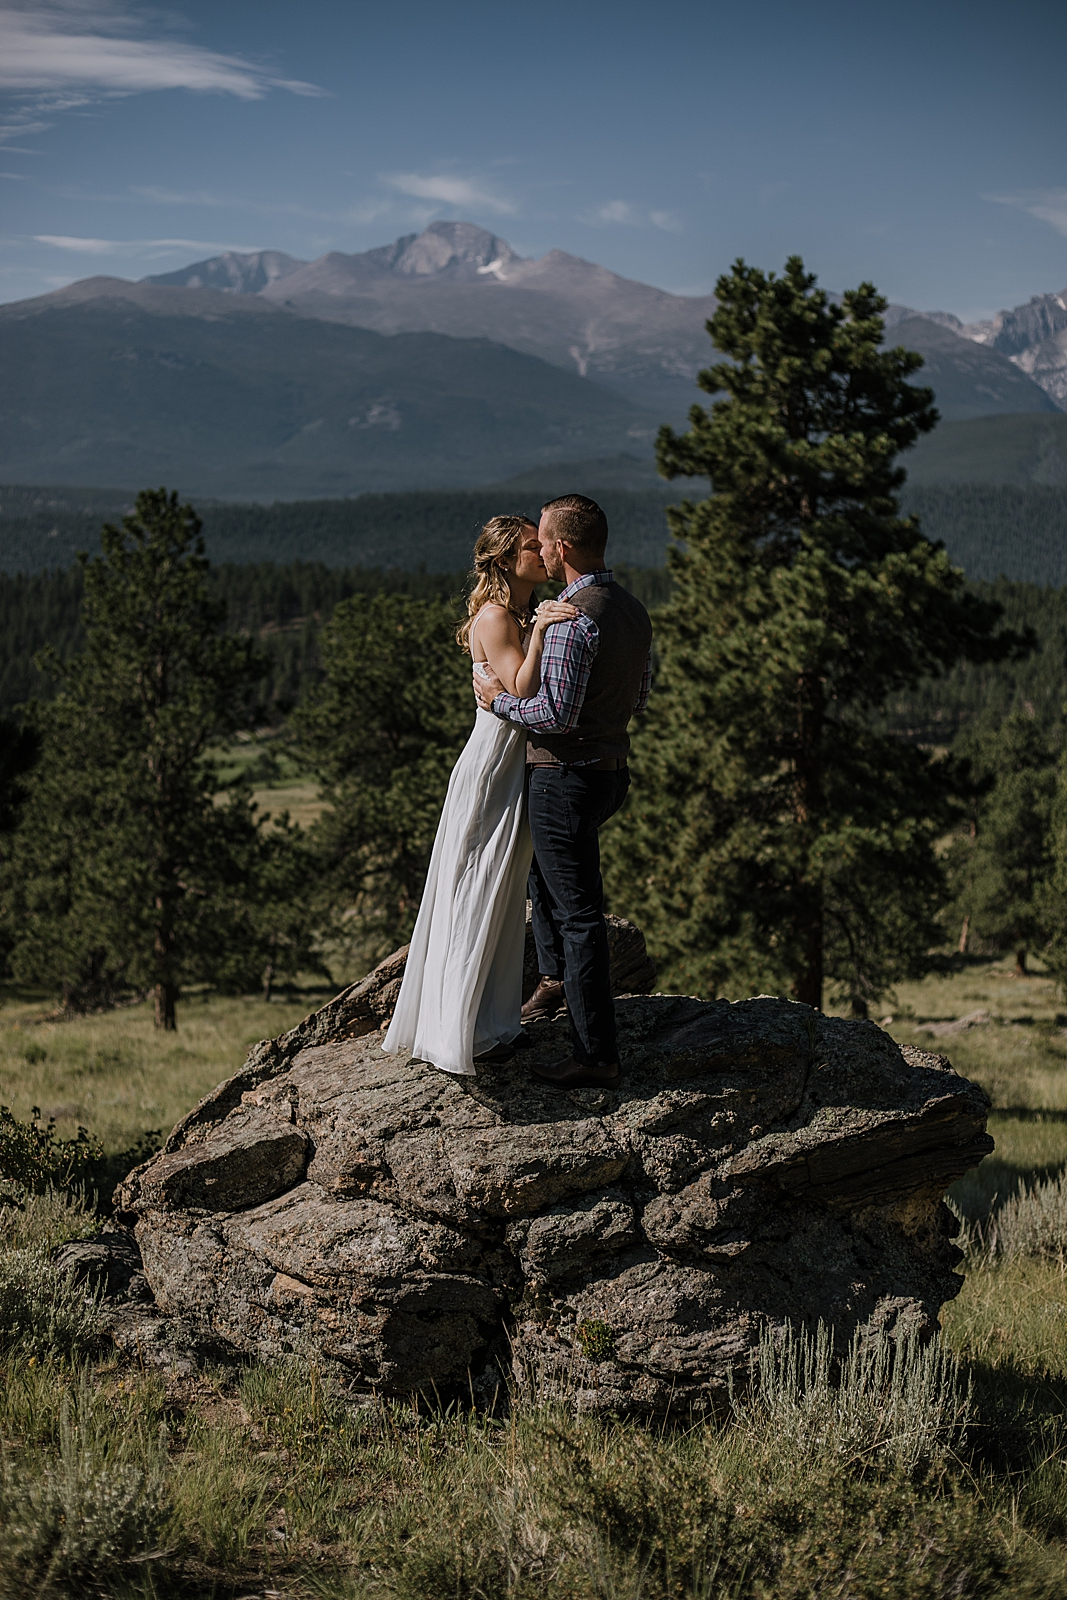 couple kissing, RMNP elopement ceremony, rocky mountain national park elopement, 3M curves elopement, self solemnizing, self solemnization, long's peak, hiking elopement, estes park elopement